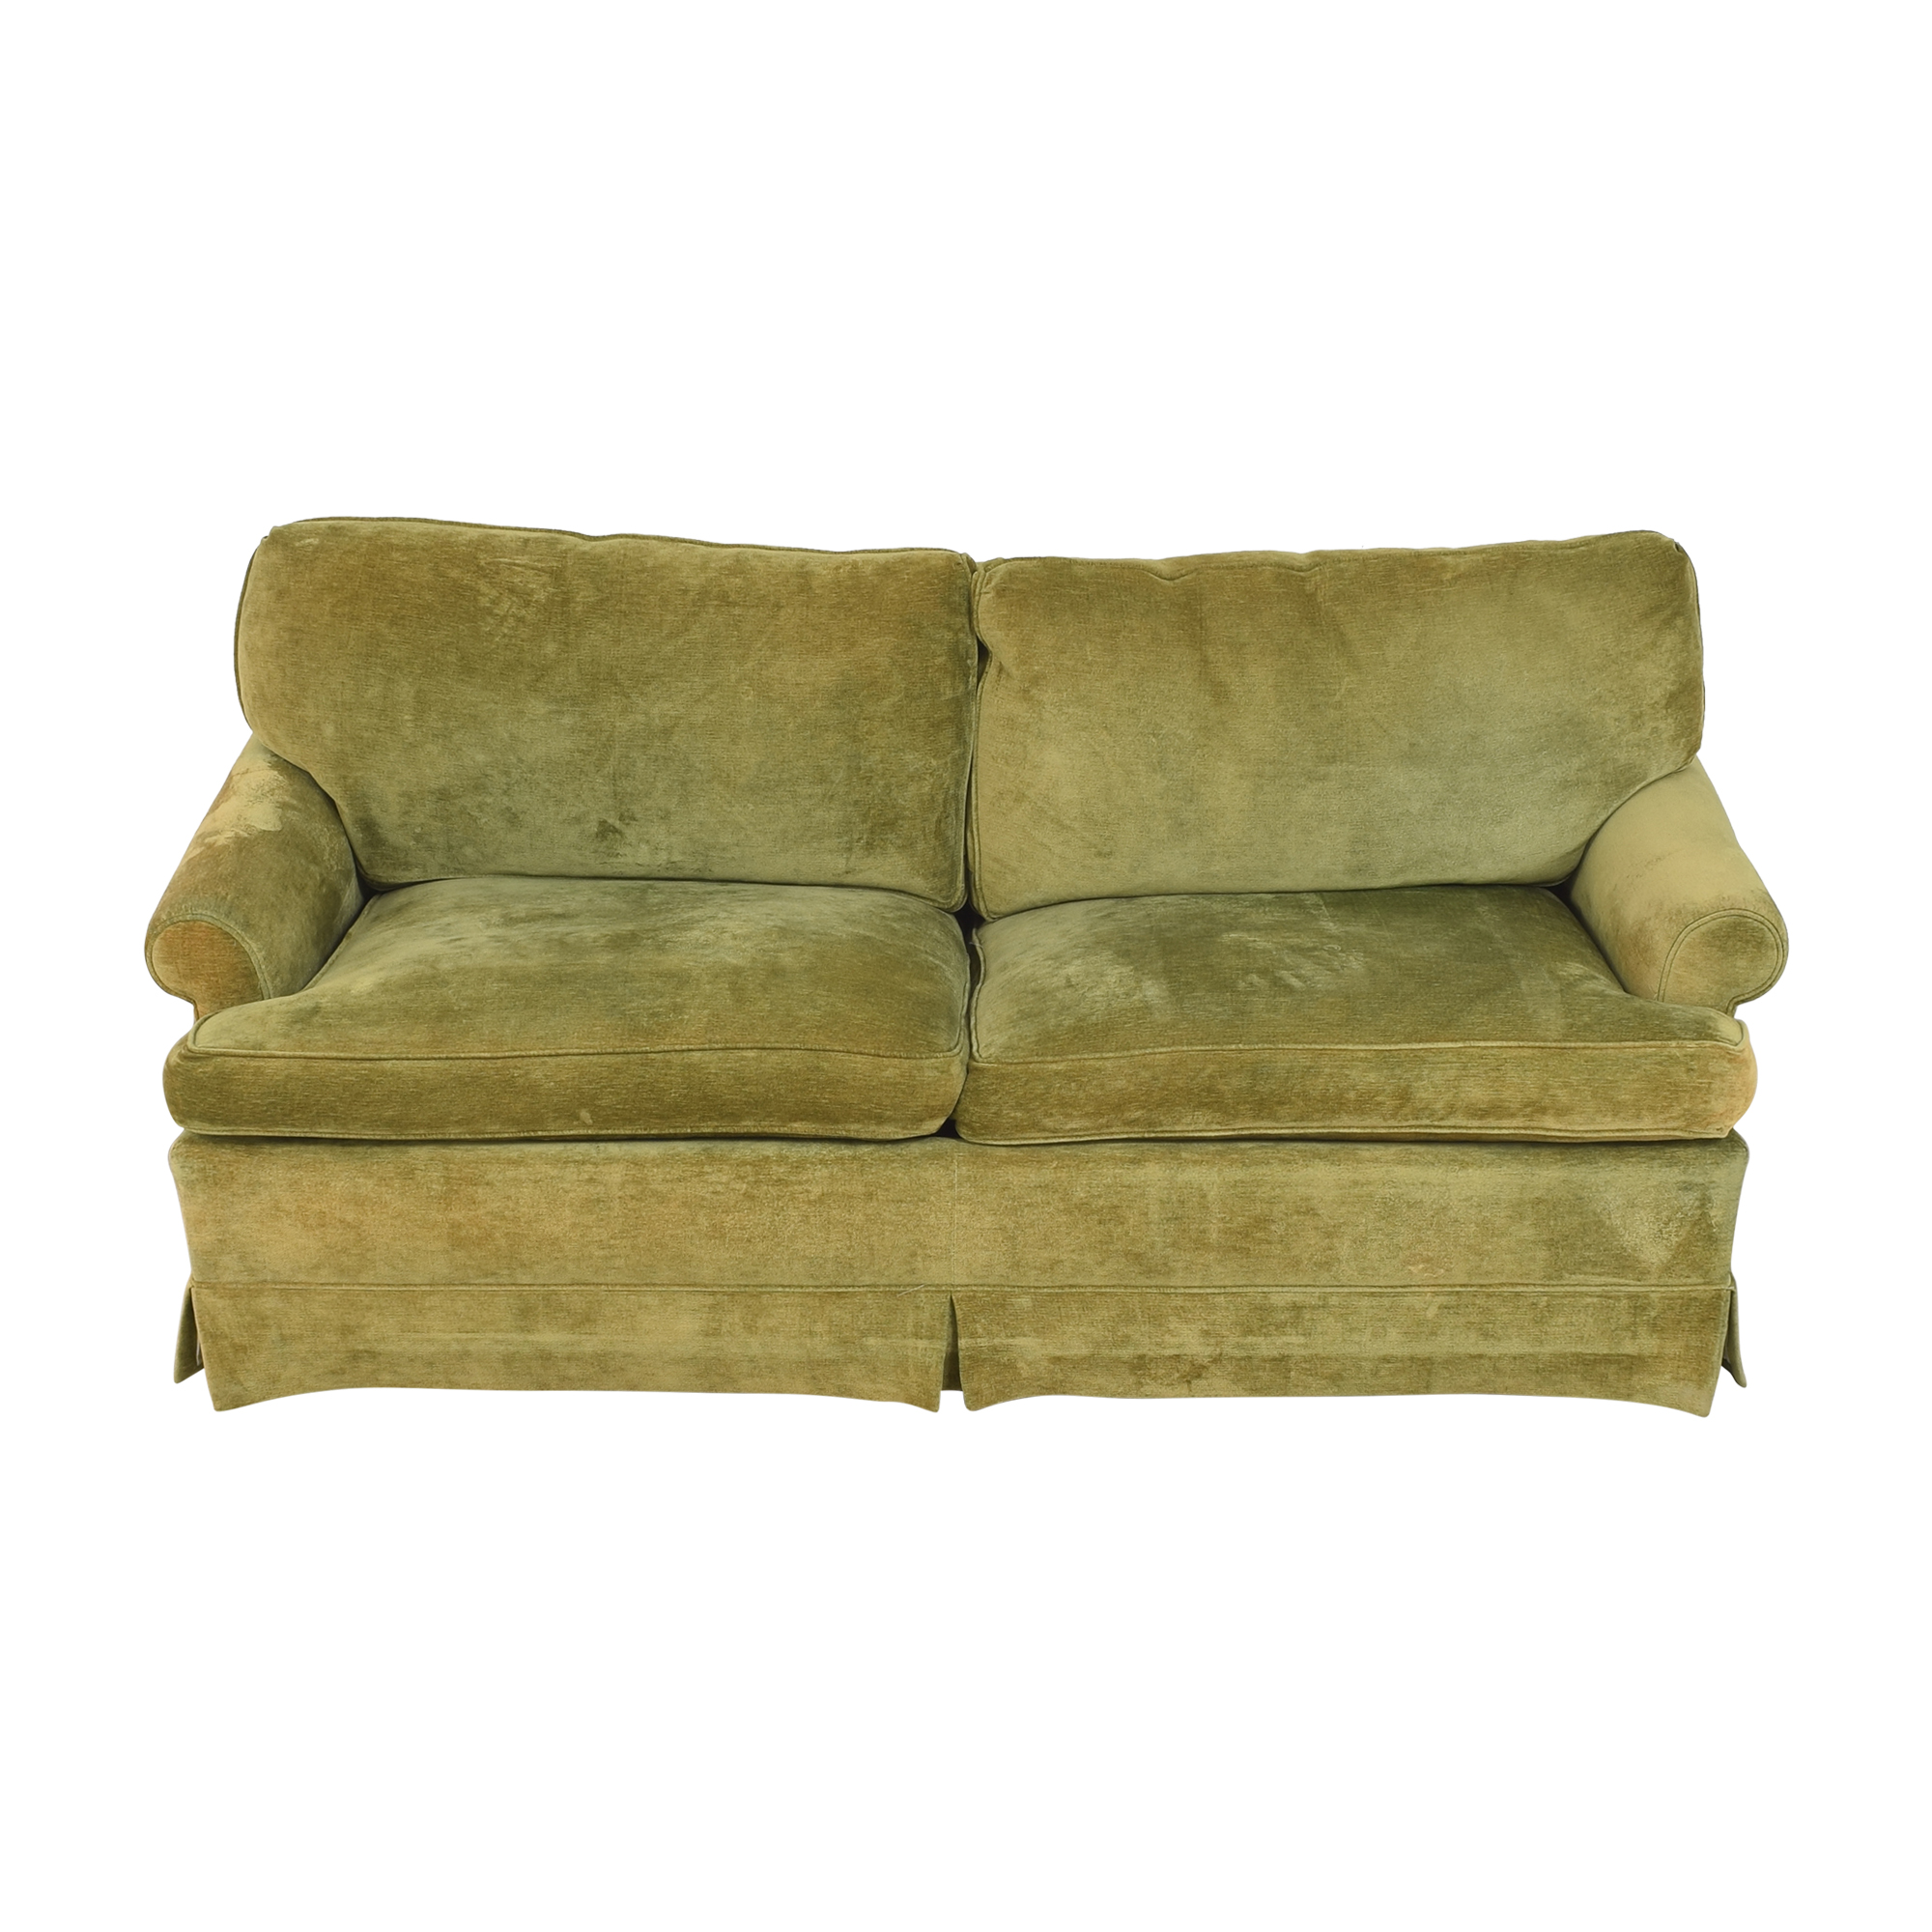 Hickory Springs Hickory Springs Two Cushion Sleeper Sofa ma